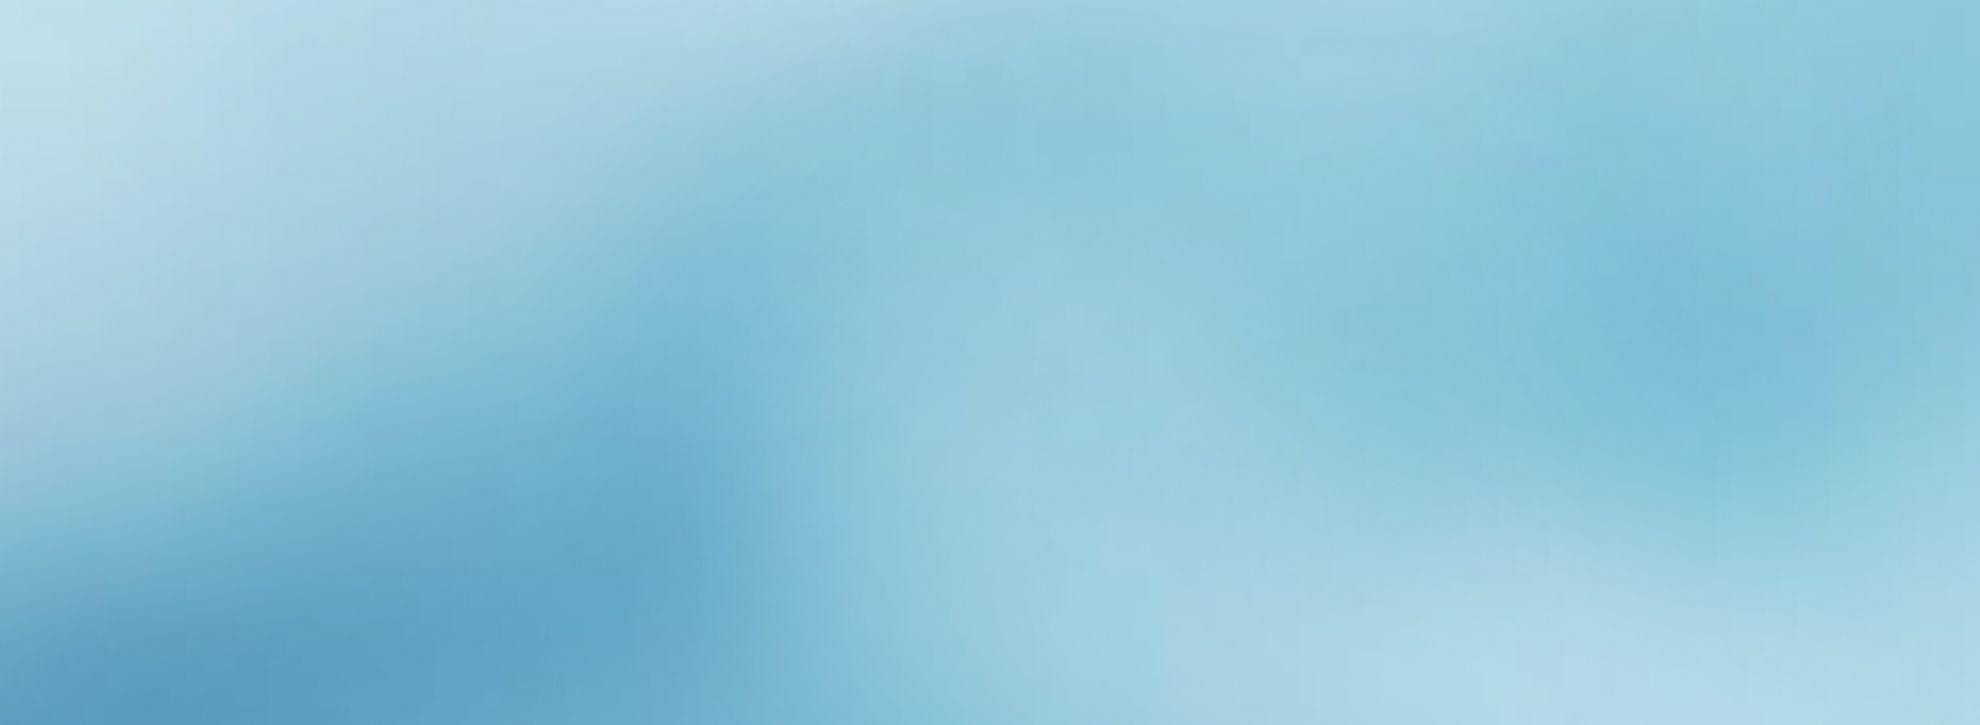 Blue_backdrop